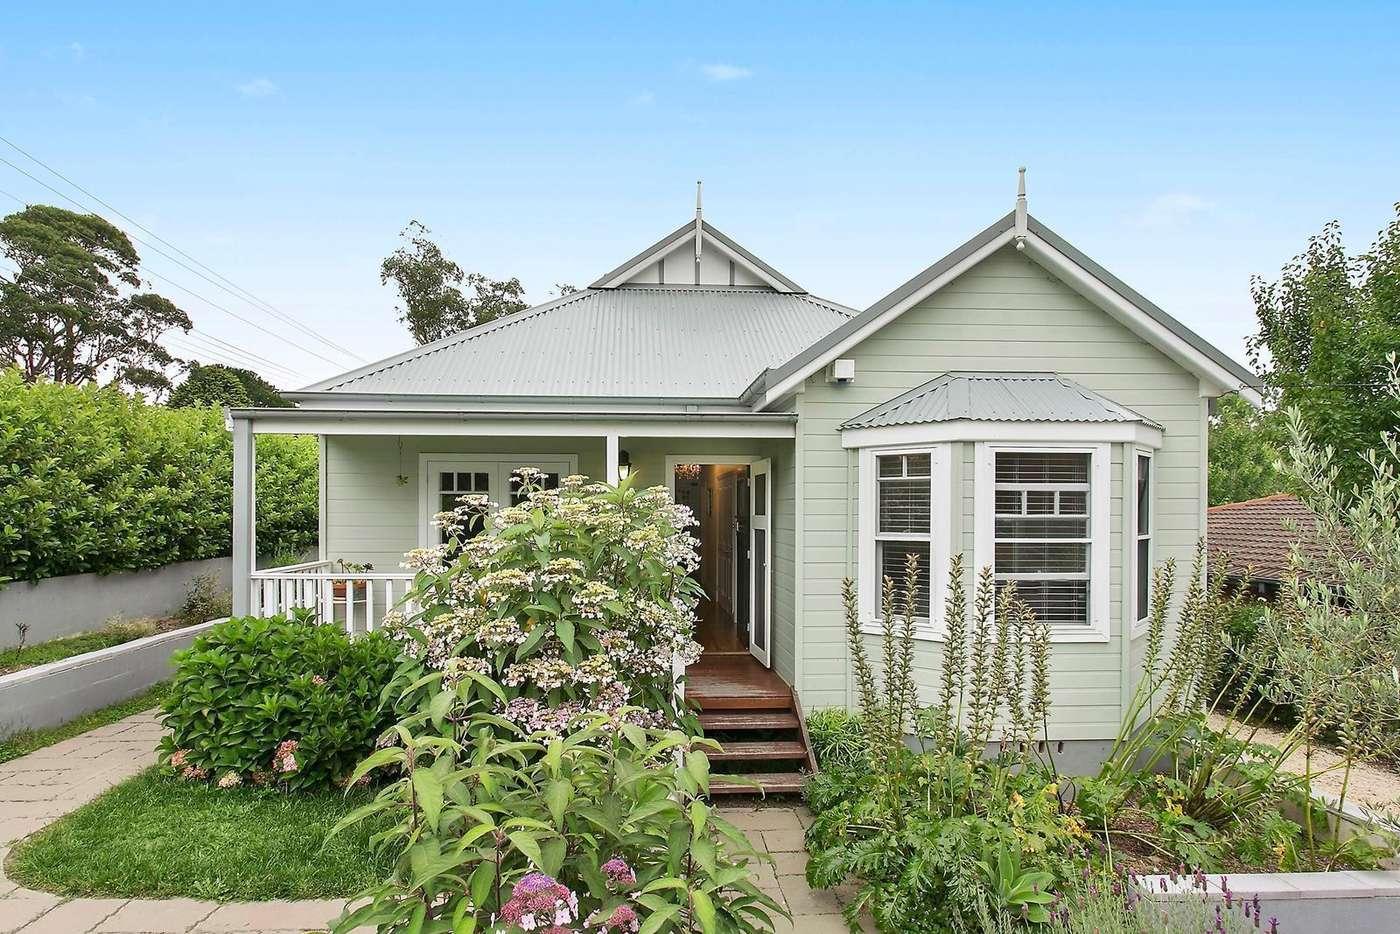 Main view of Homely house listing, 29 Leura Mall, Leura NSW 2780